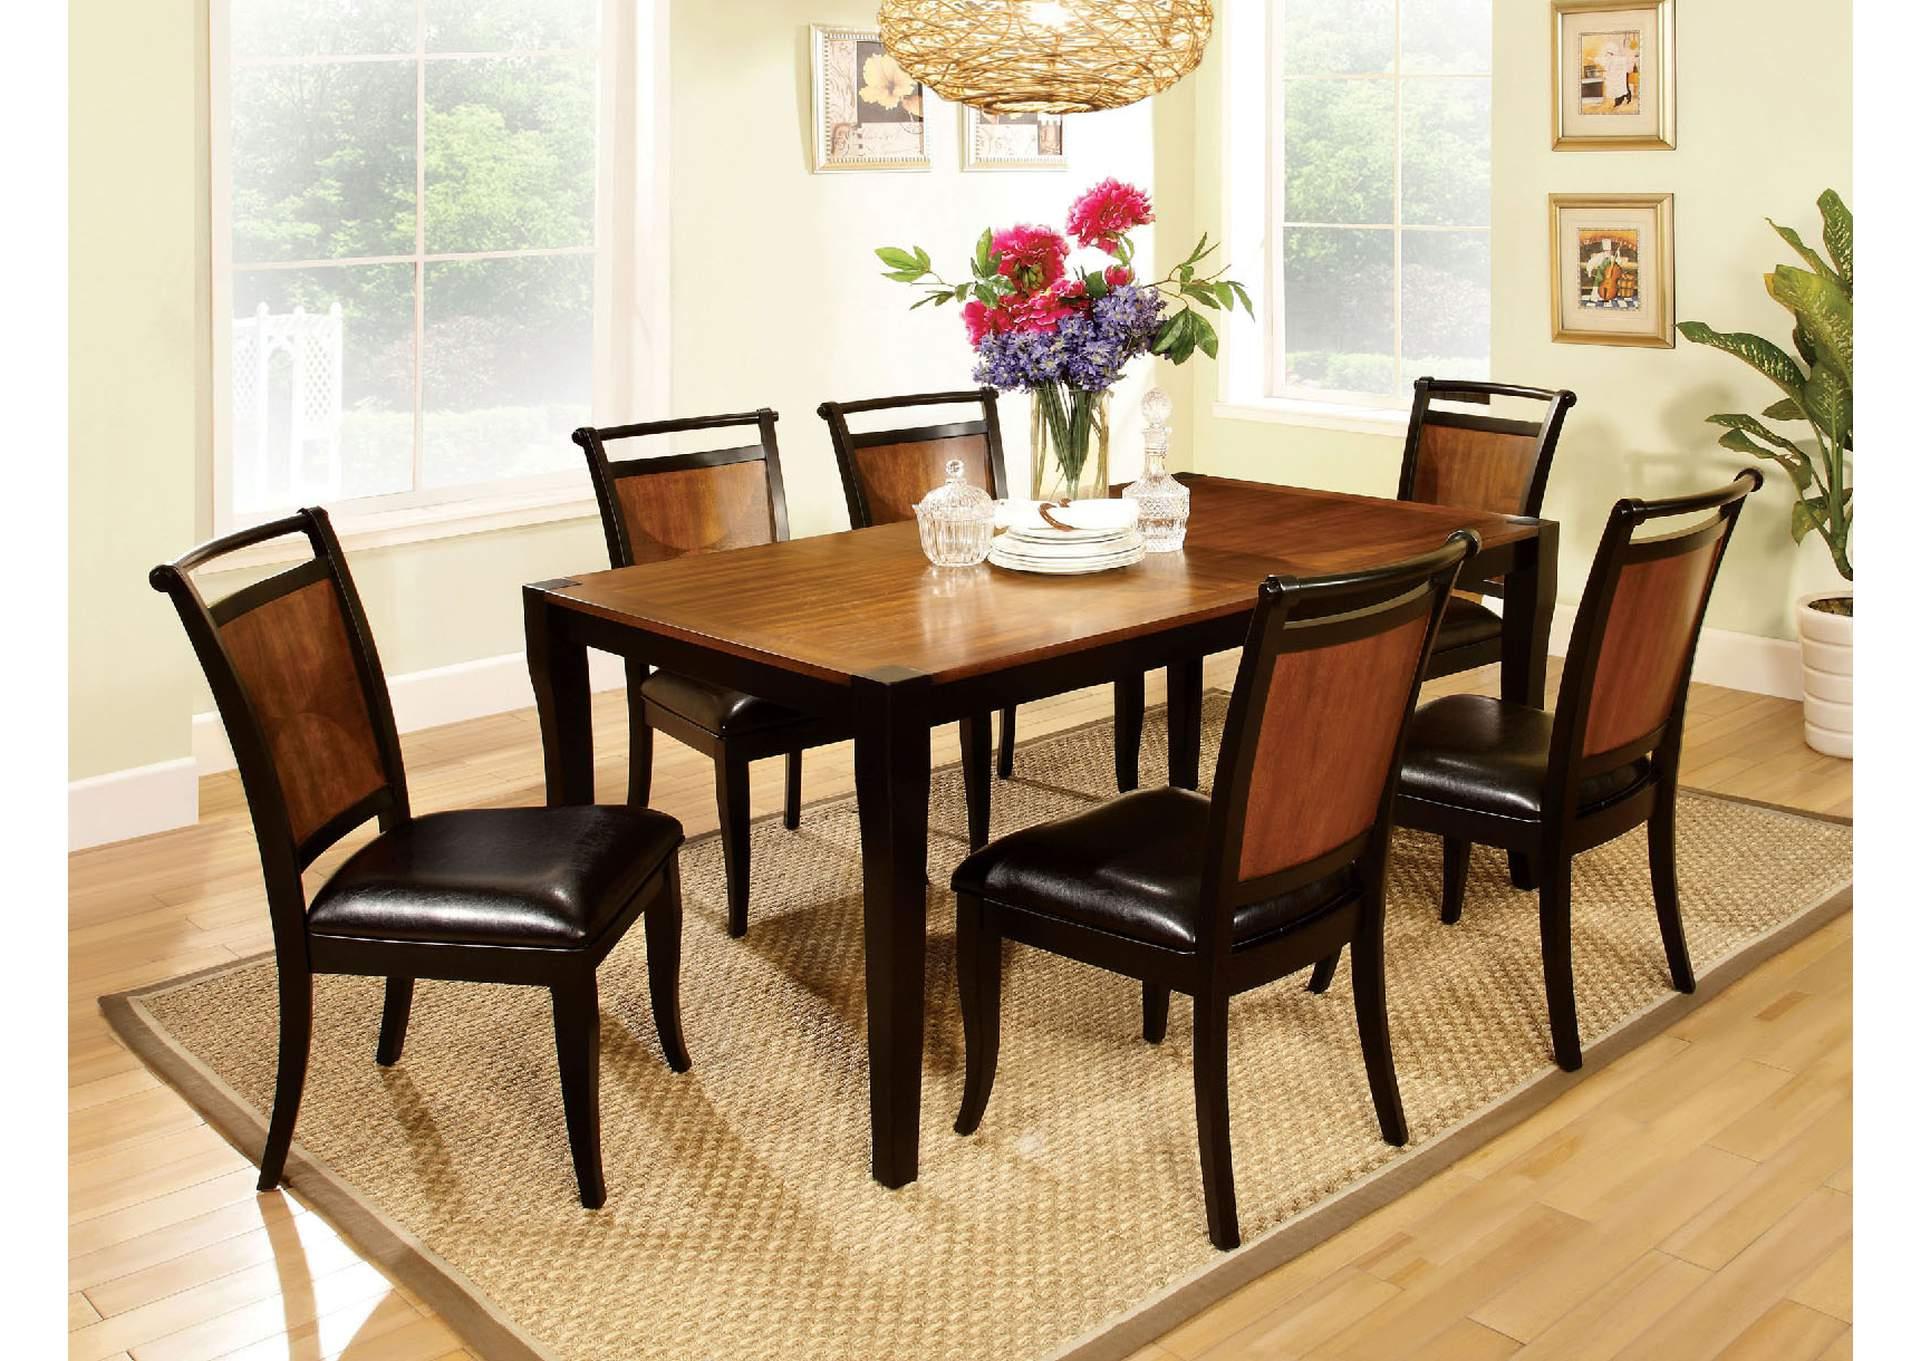 Salida L Black U0026 Acacia Dining Table W/4 Side Chairs,Furniture Of America